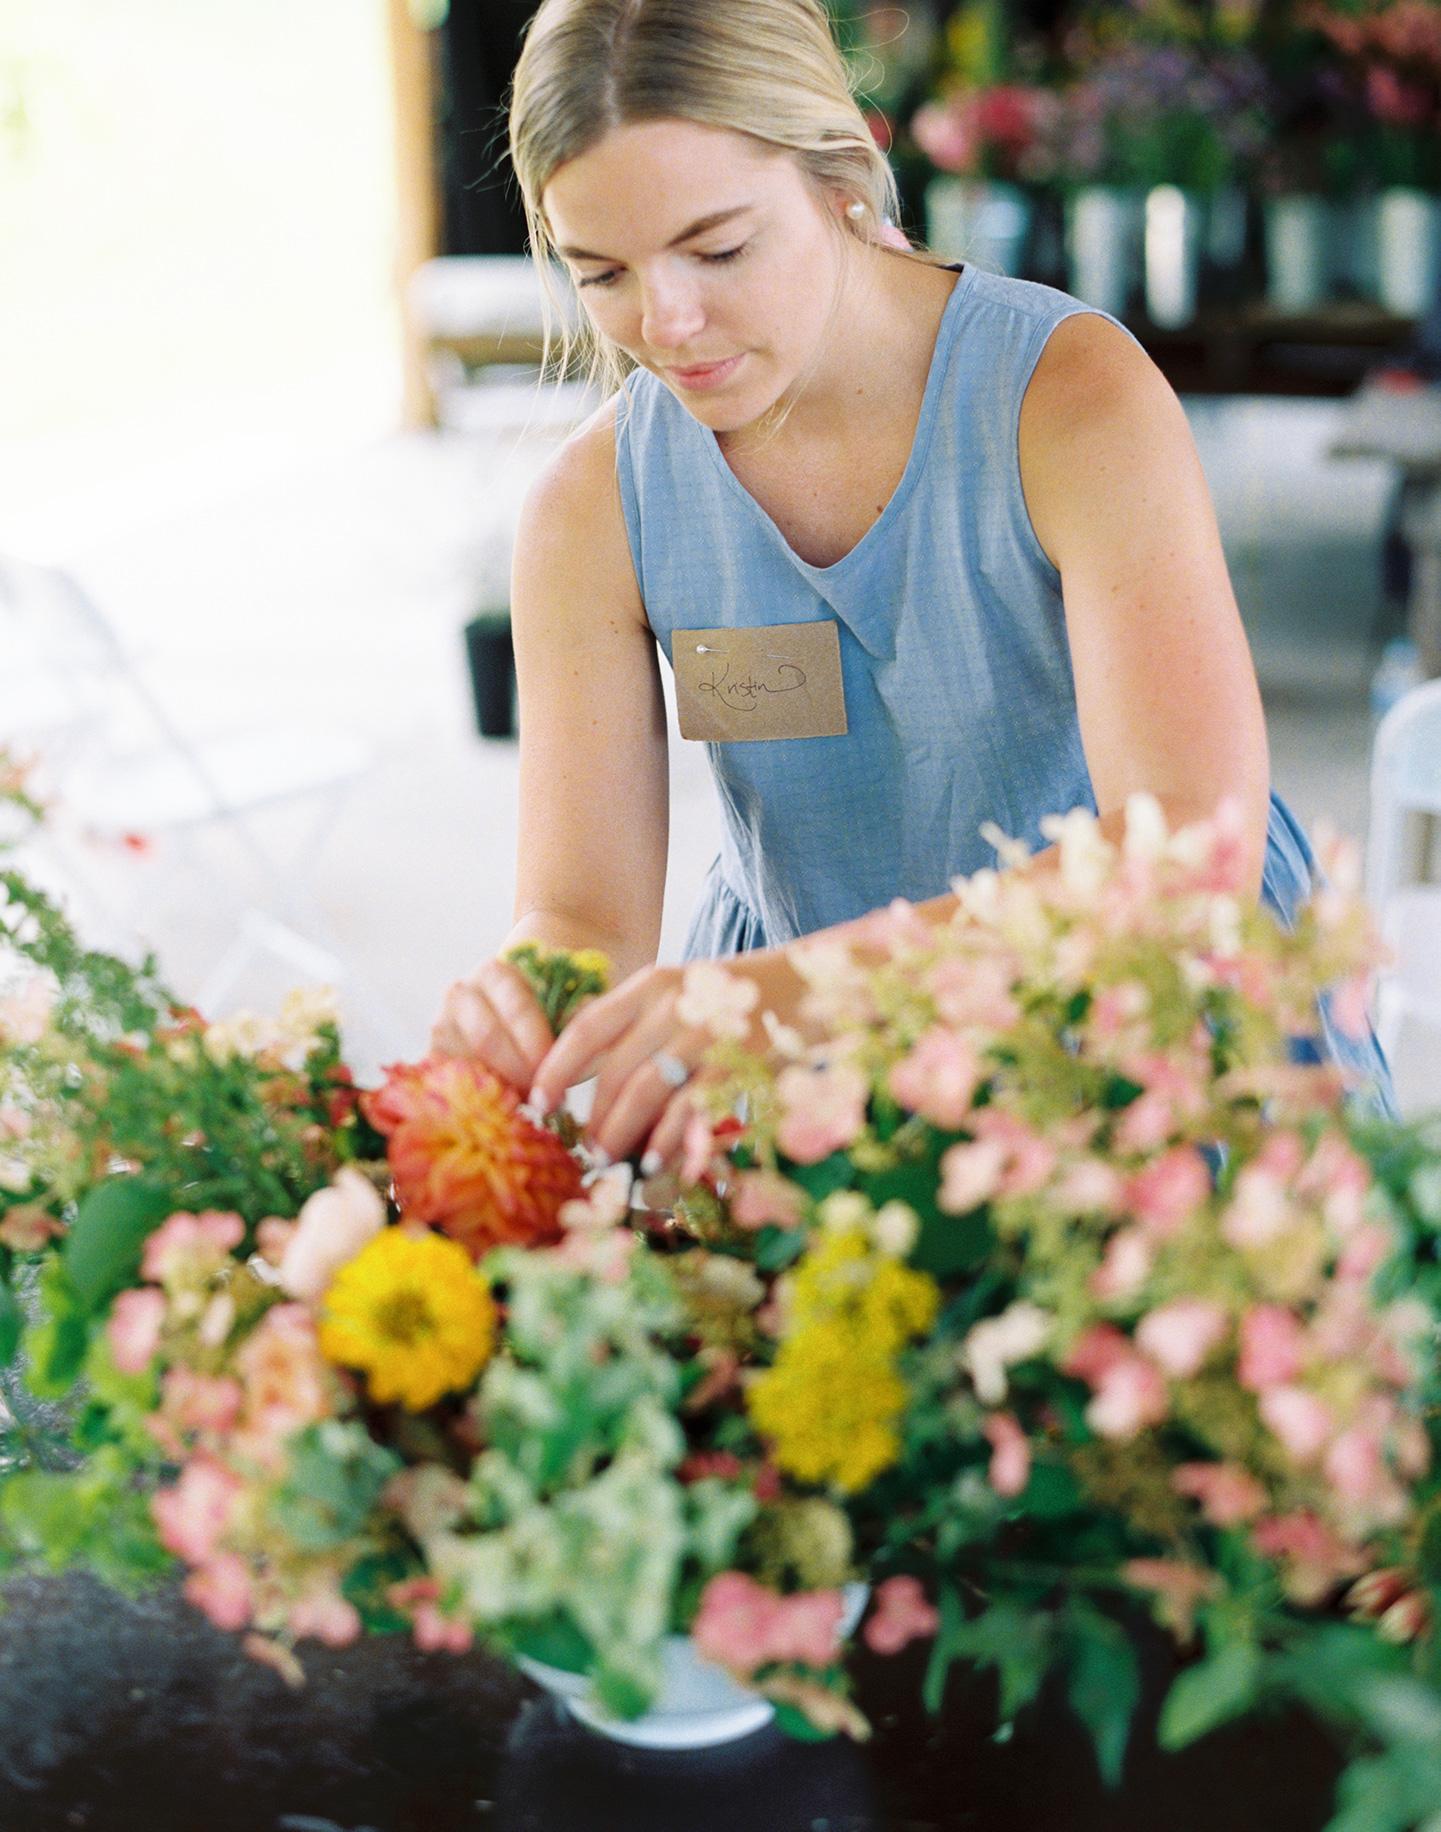 Ponderosa & Thyme Floral Workshop Review